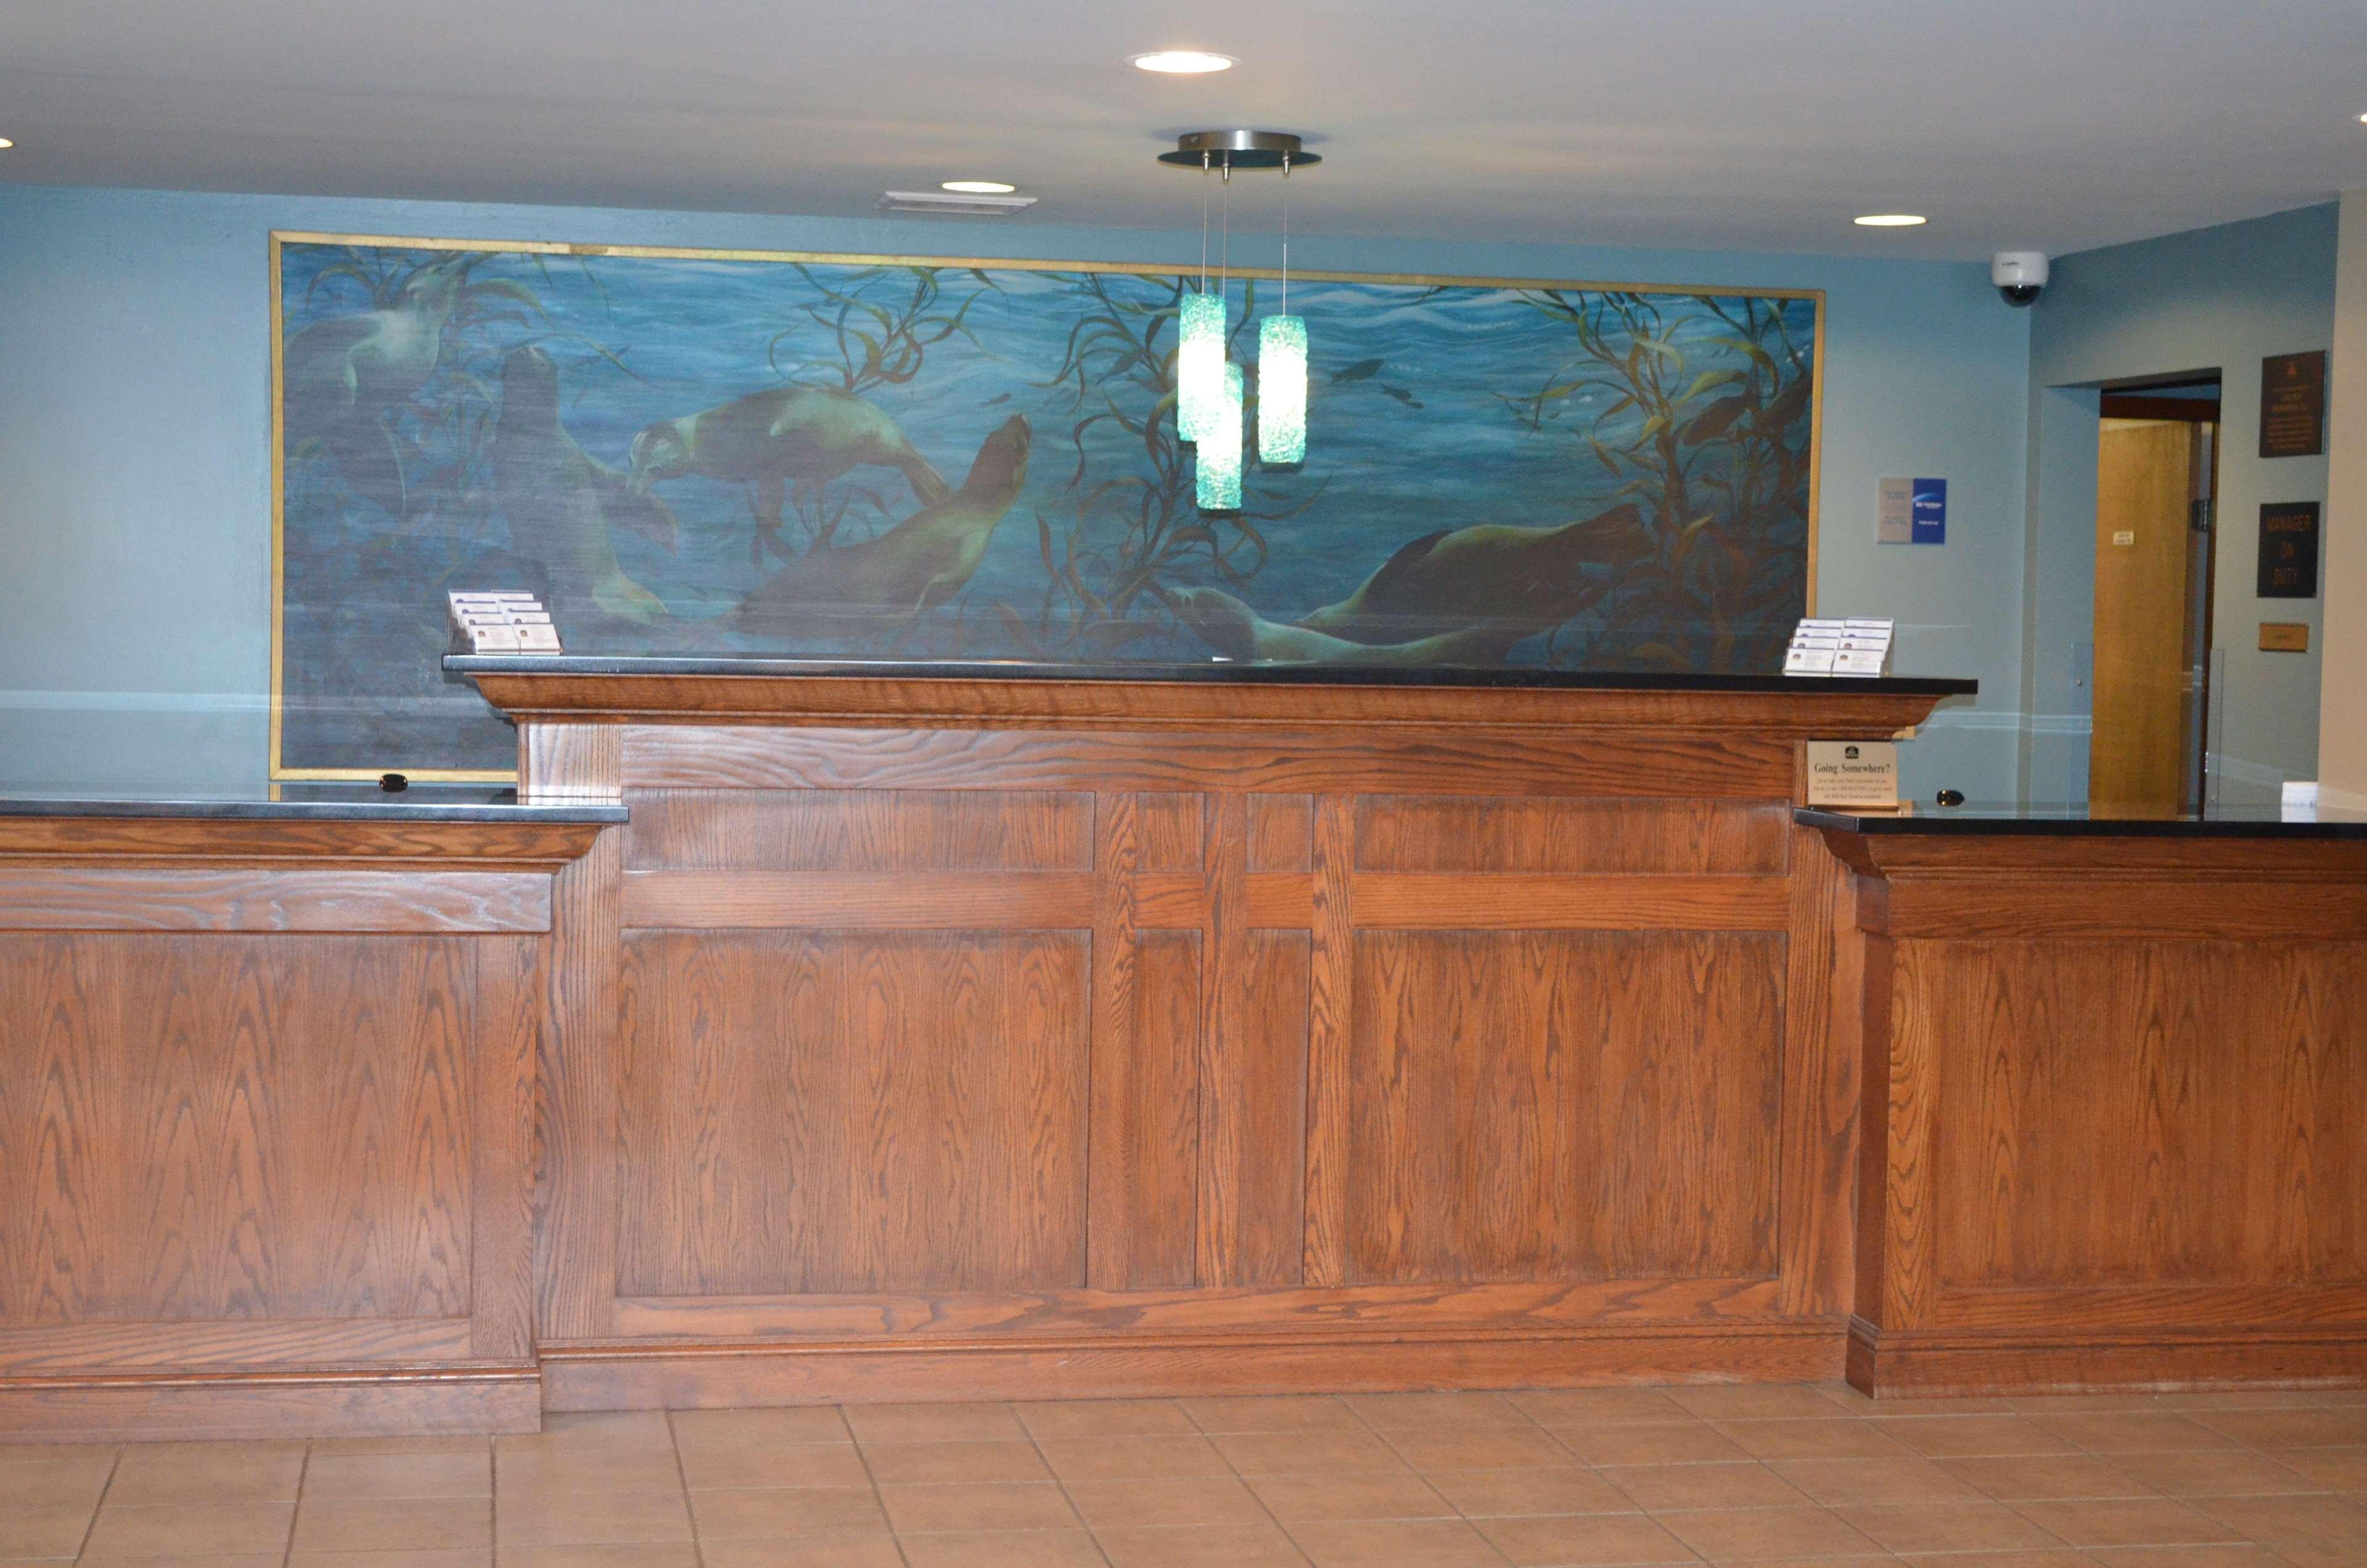 Best Western Agate Beach Inn image 11